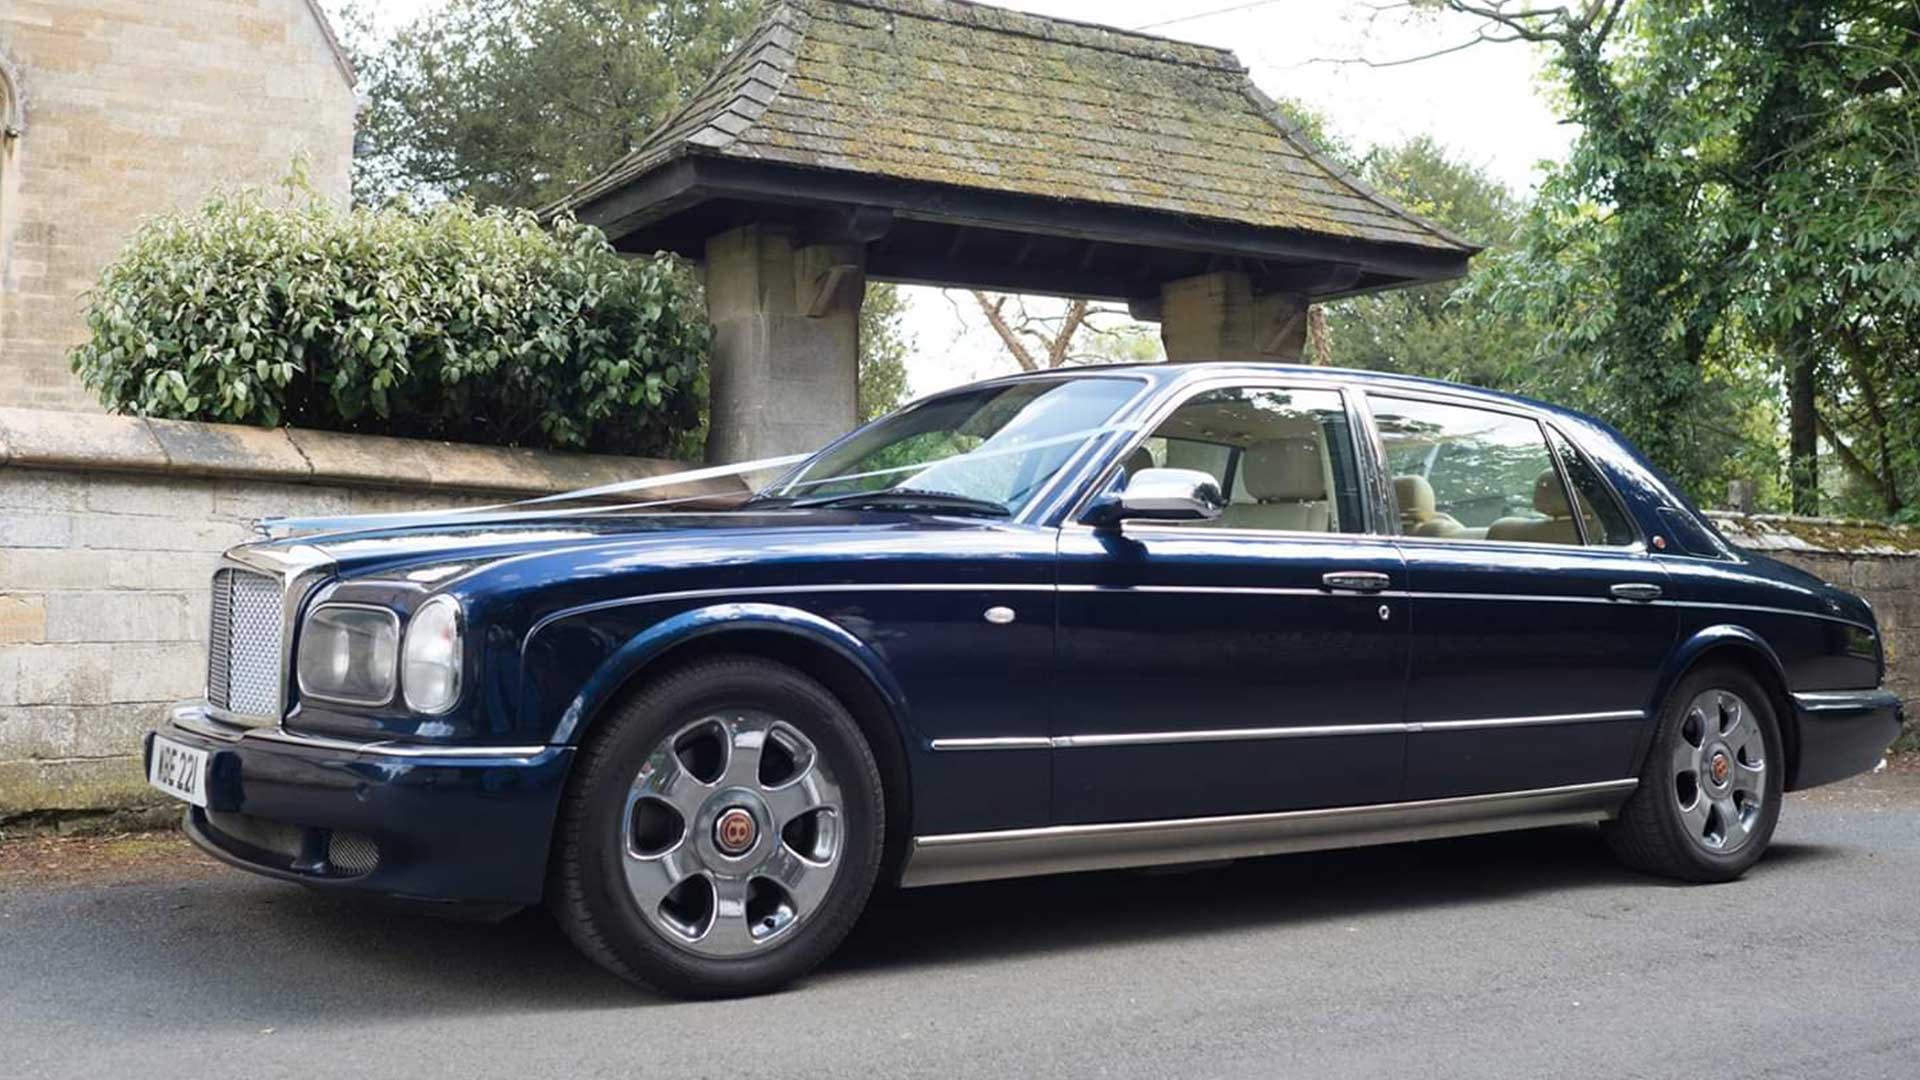 The Bentley Arnage wedding car in blue